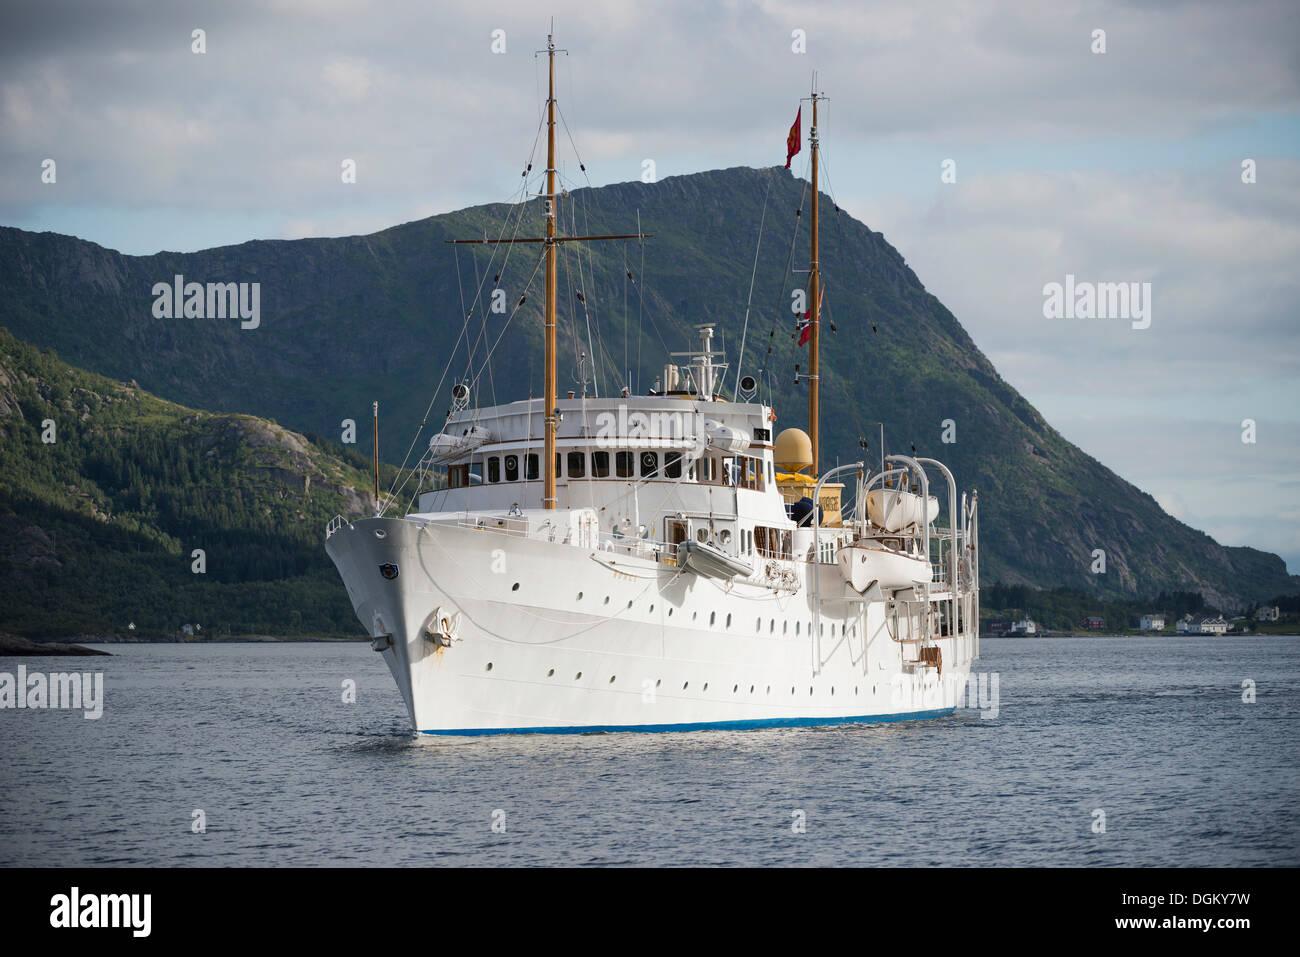 Royal yacht 'Norge' in Vestfjord, Vestfjord, Inselgruppe Lofoten, Nordland, Northern Norway, Norway - Stock Image